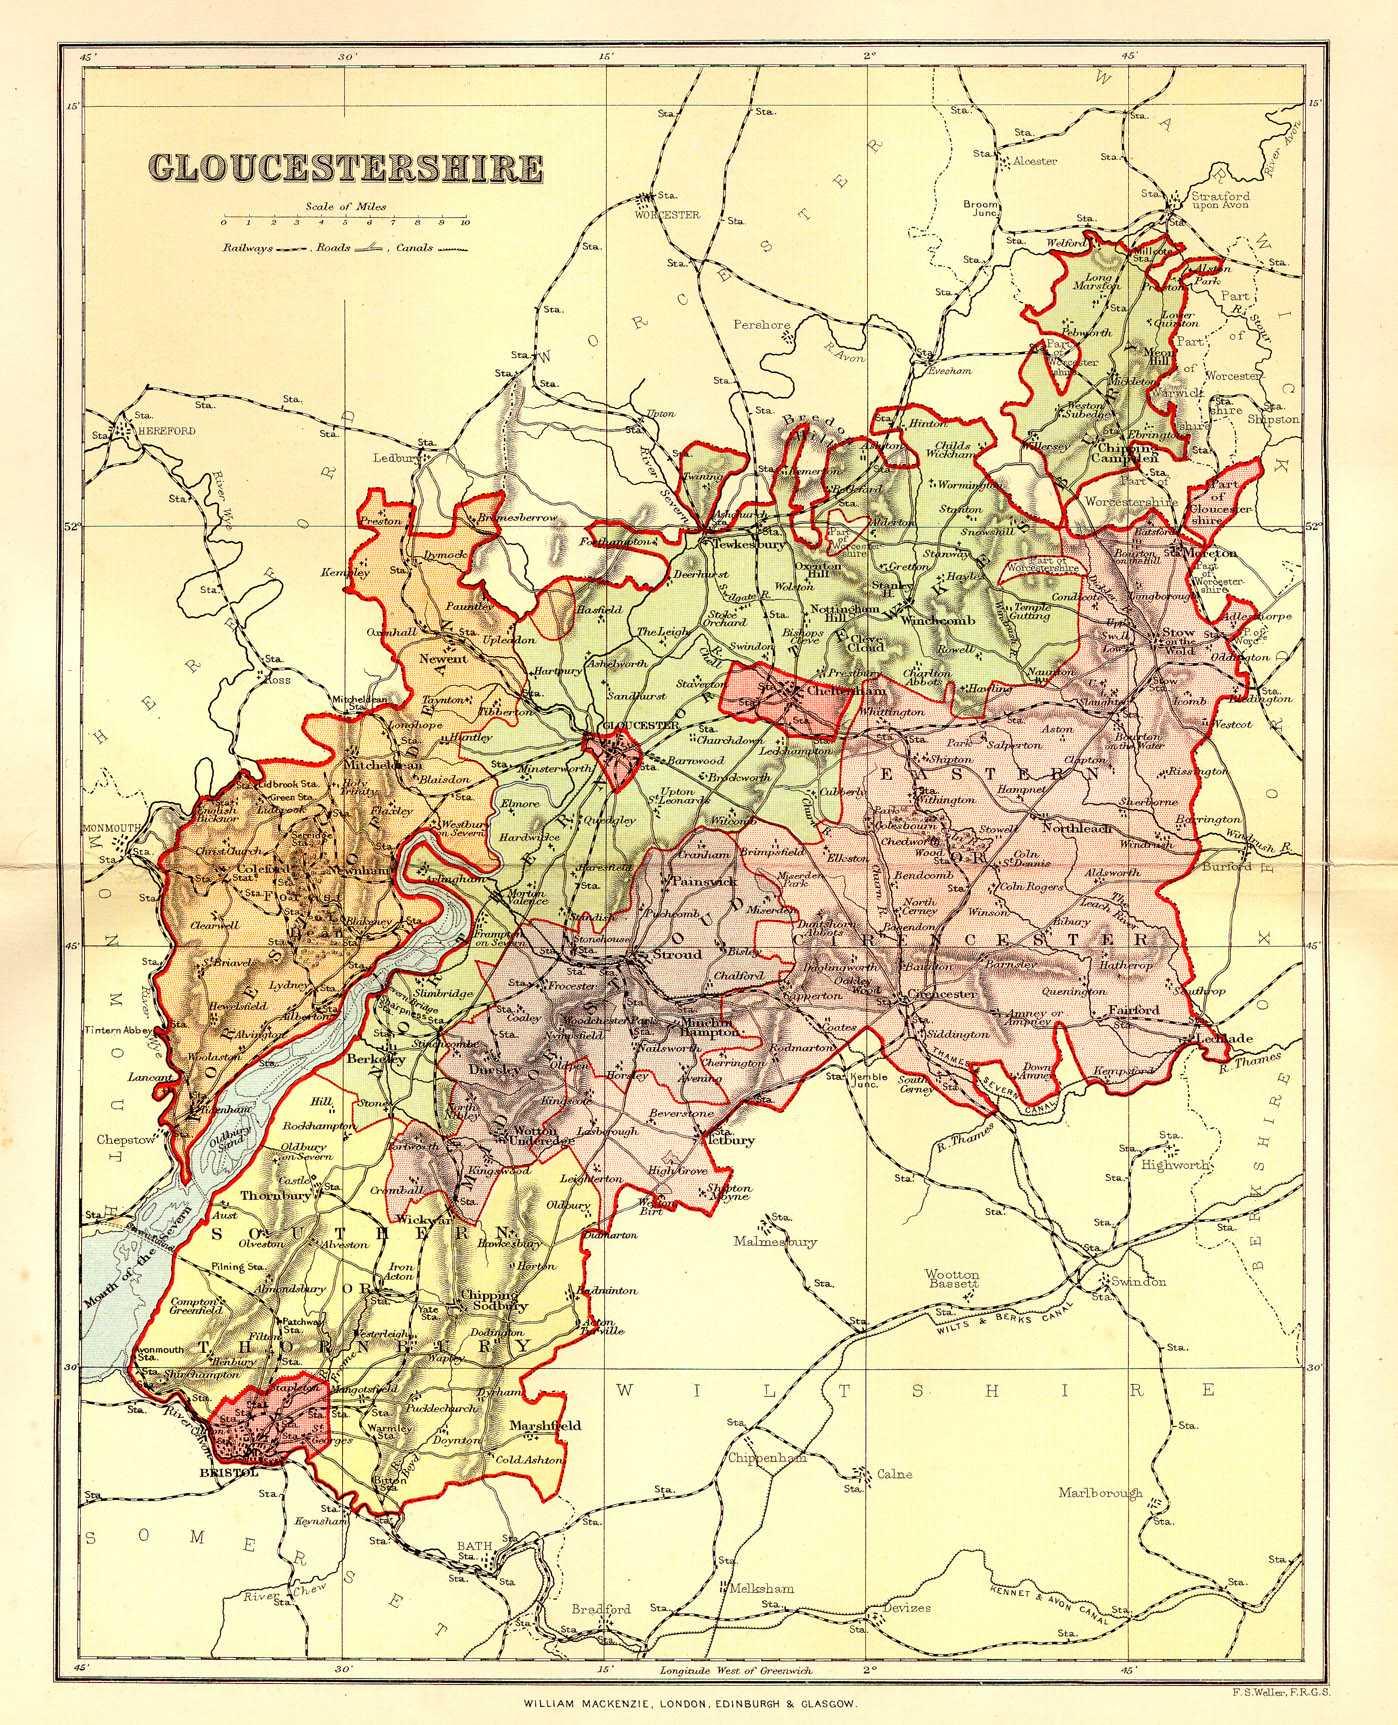 Historical description of Gloucestershire England